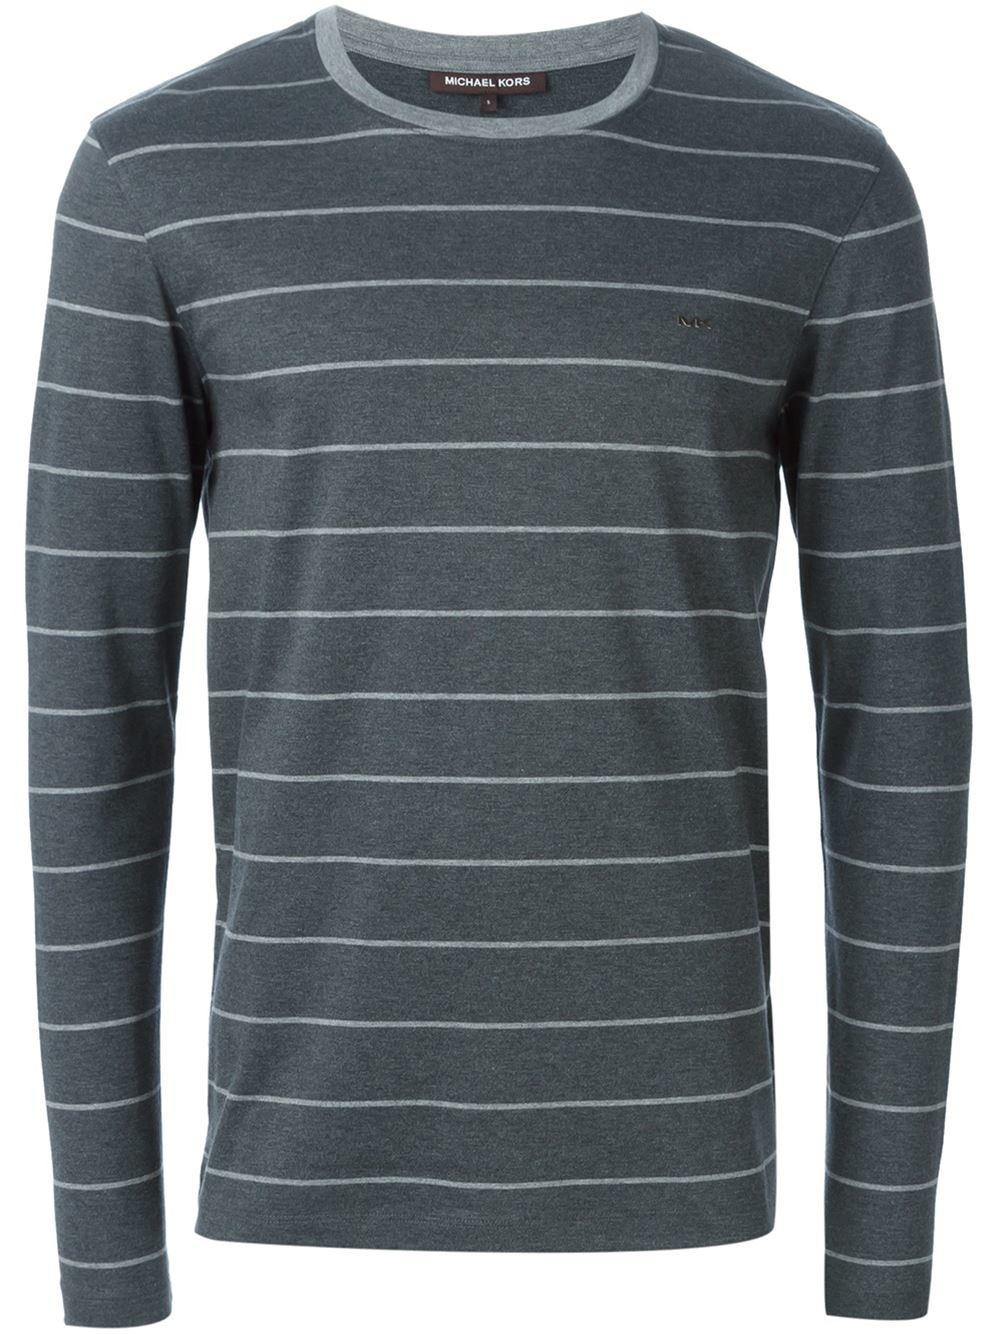 michael kors striped longsleeved t shirt in gray for men. Black Bedroom Furniture Sets. Home Design Ideas